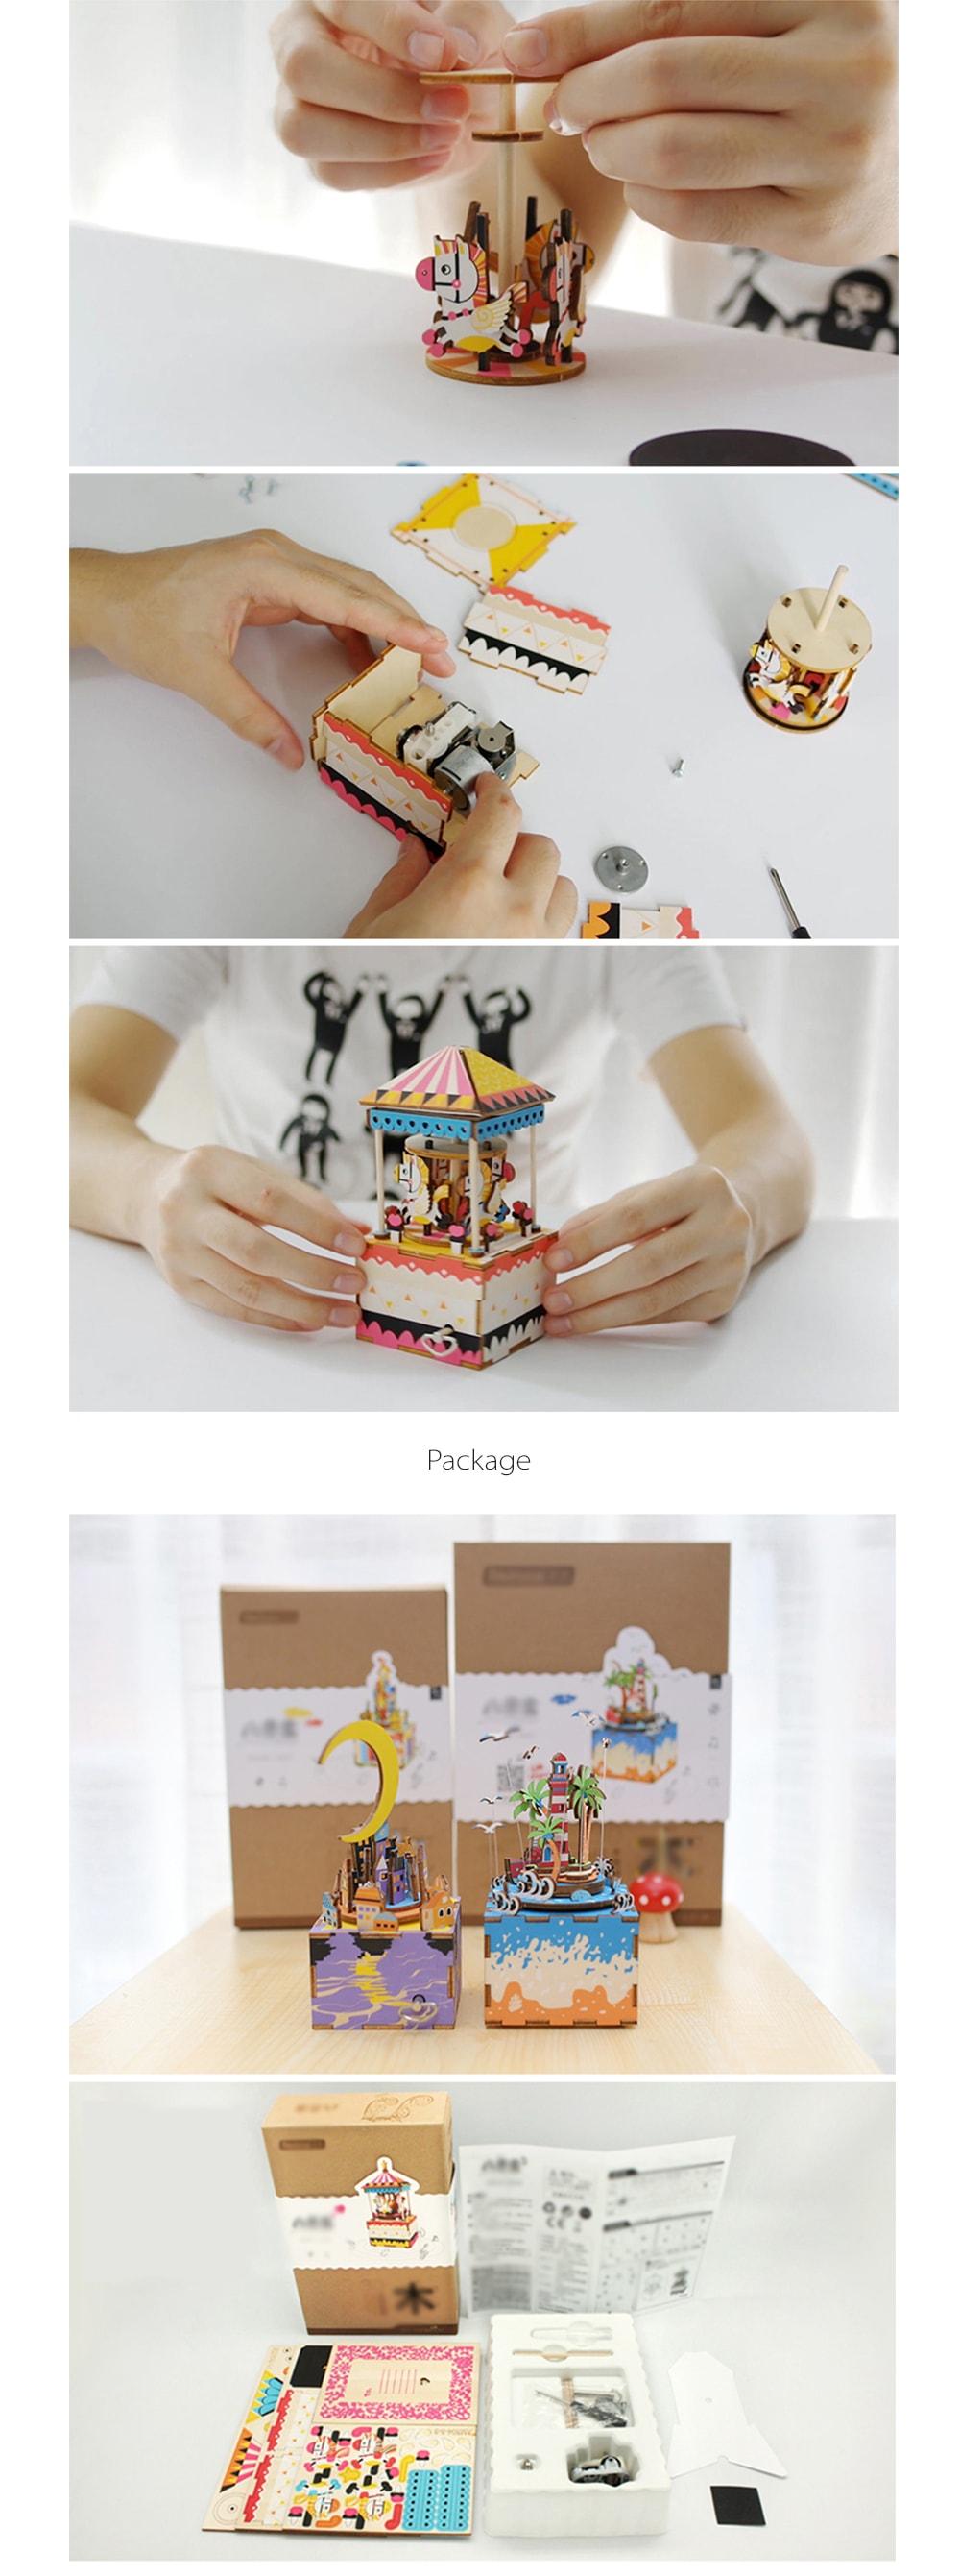 3D Puzzle Wooden Music Box DIY Art Project